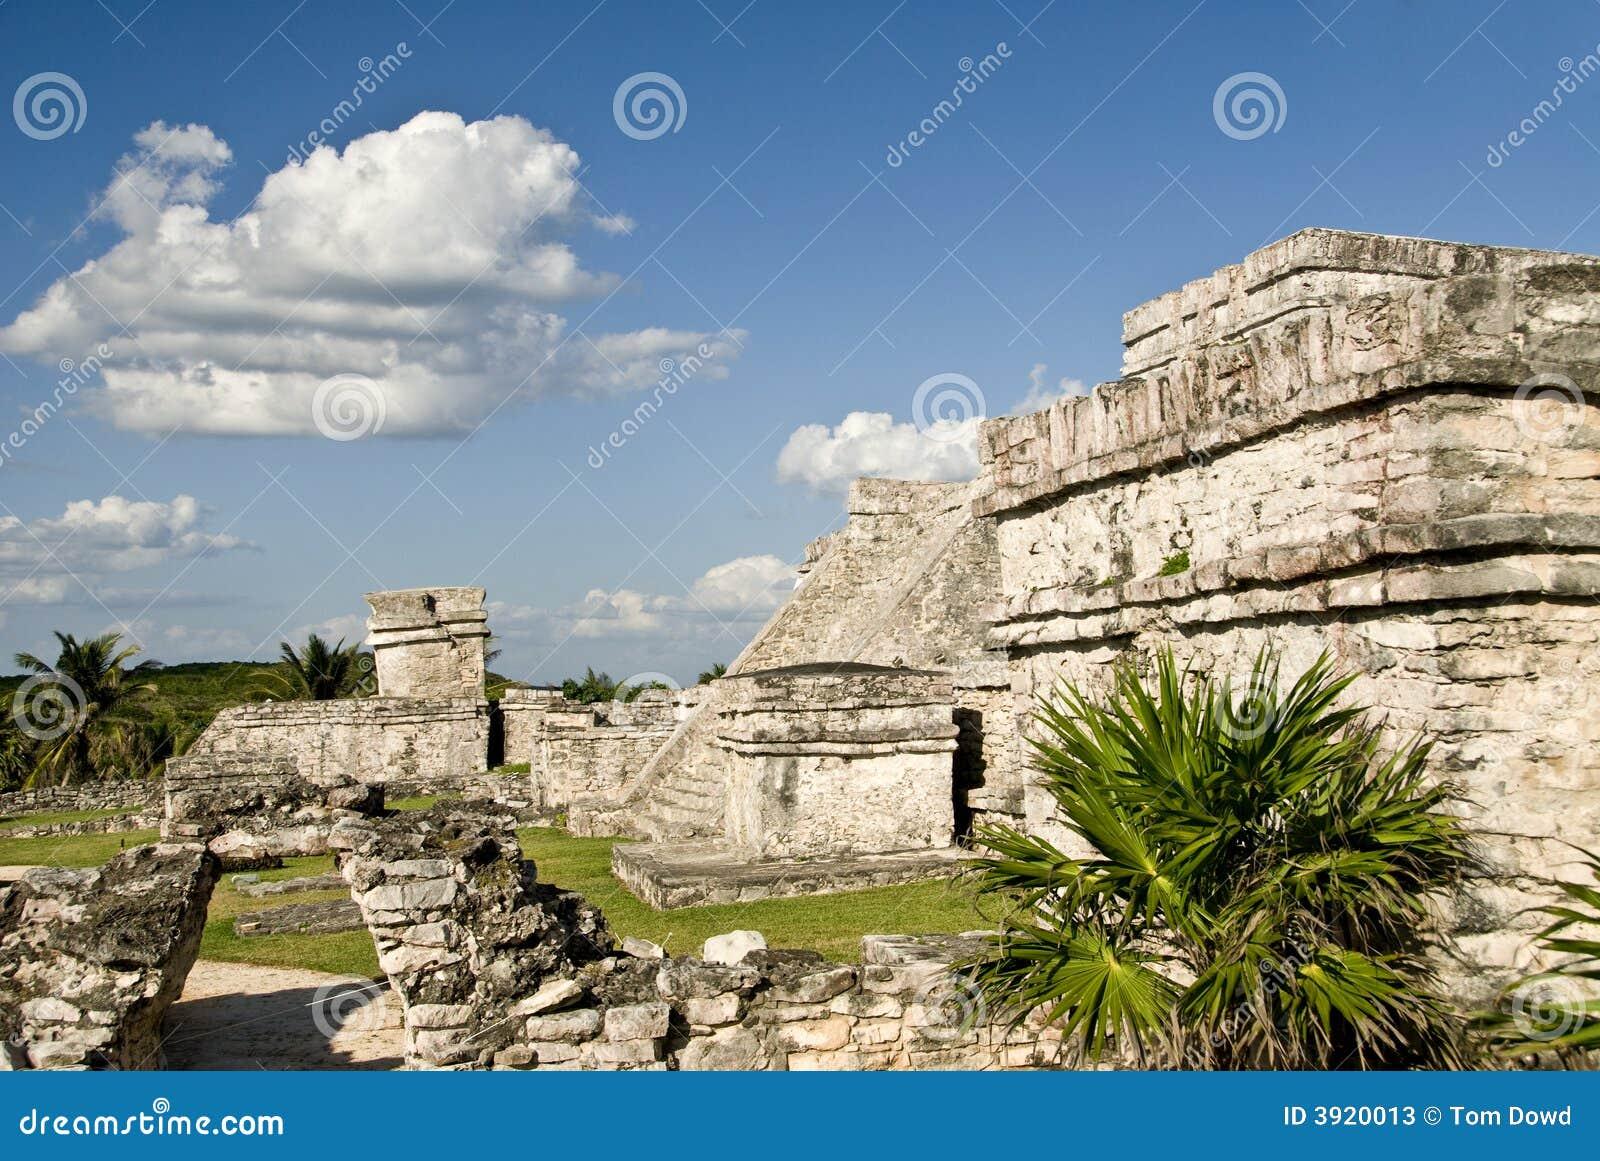 Ruínas da pirâmide em Tulum México